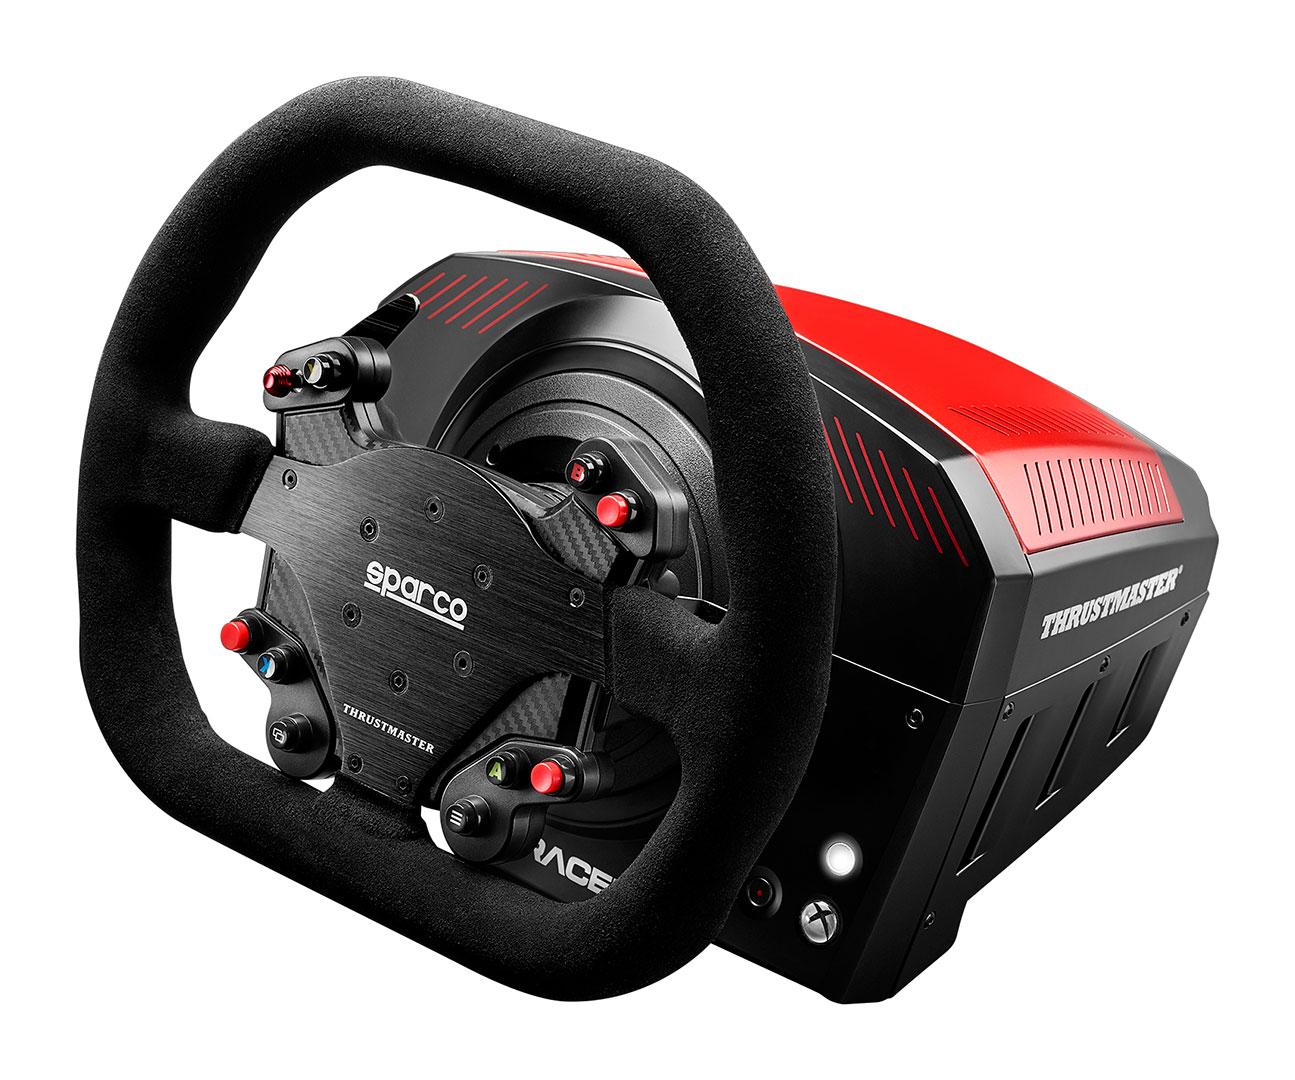 thrustmaster ts xw racer sparco p310 competition mod test complet volant les num riques. Black Bedroom Furniture Sets. Home Design Ideas